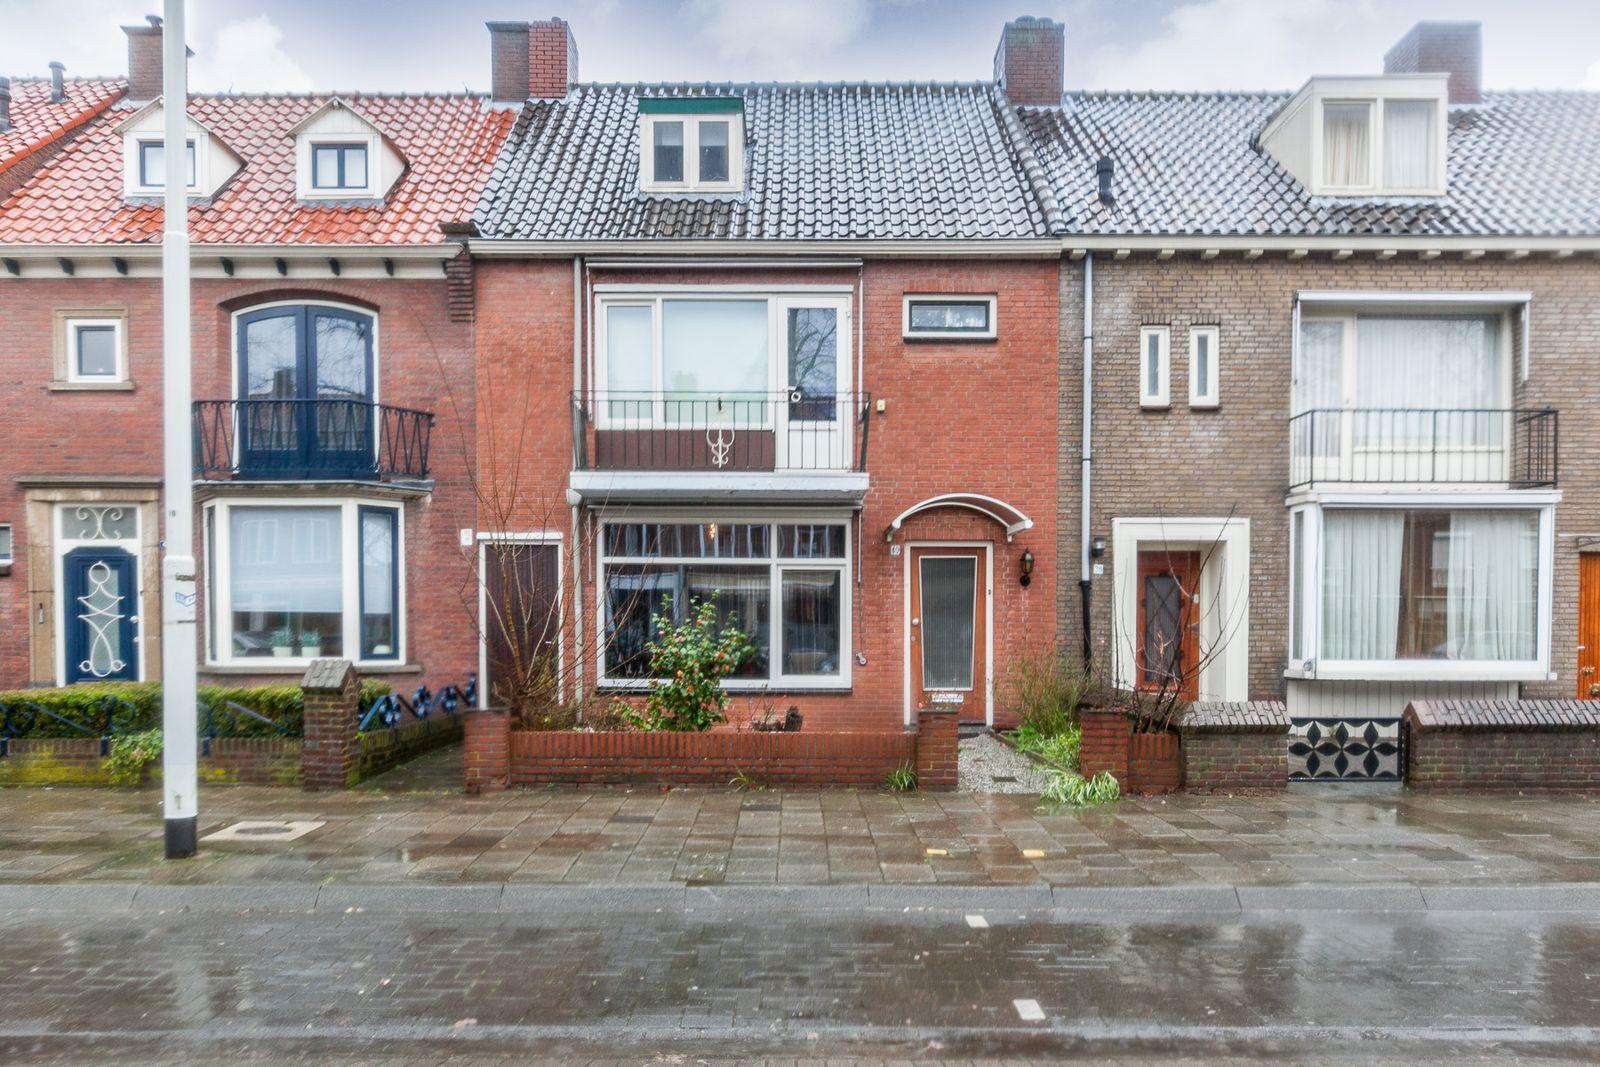 Bredalaan 40, Eindhoven